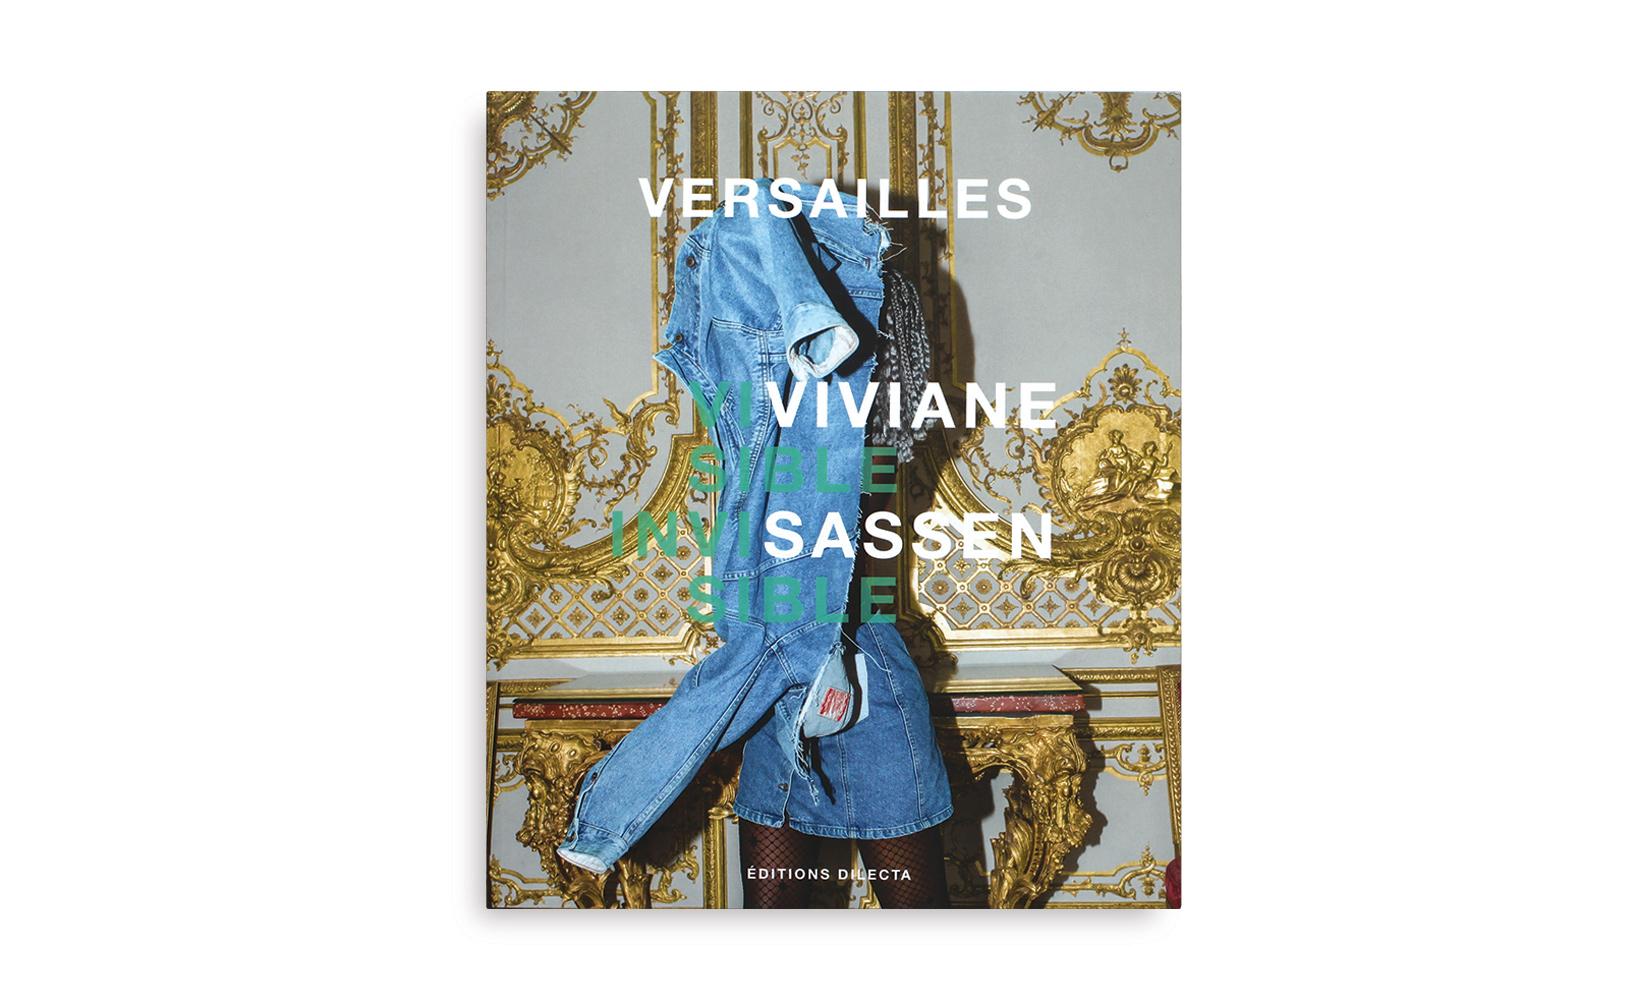 versailles-visible-invisible-toluca-studio-olivier-andreotti-VIVIANE-SASSEN-1.jpg